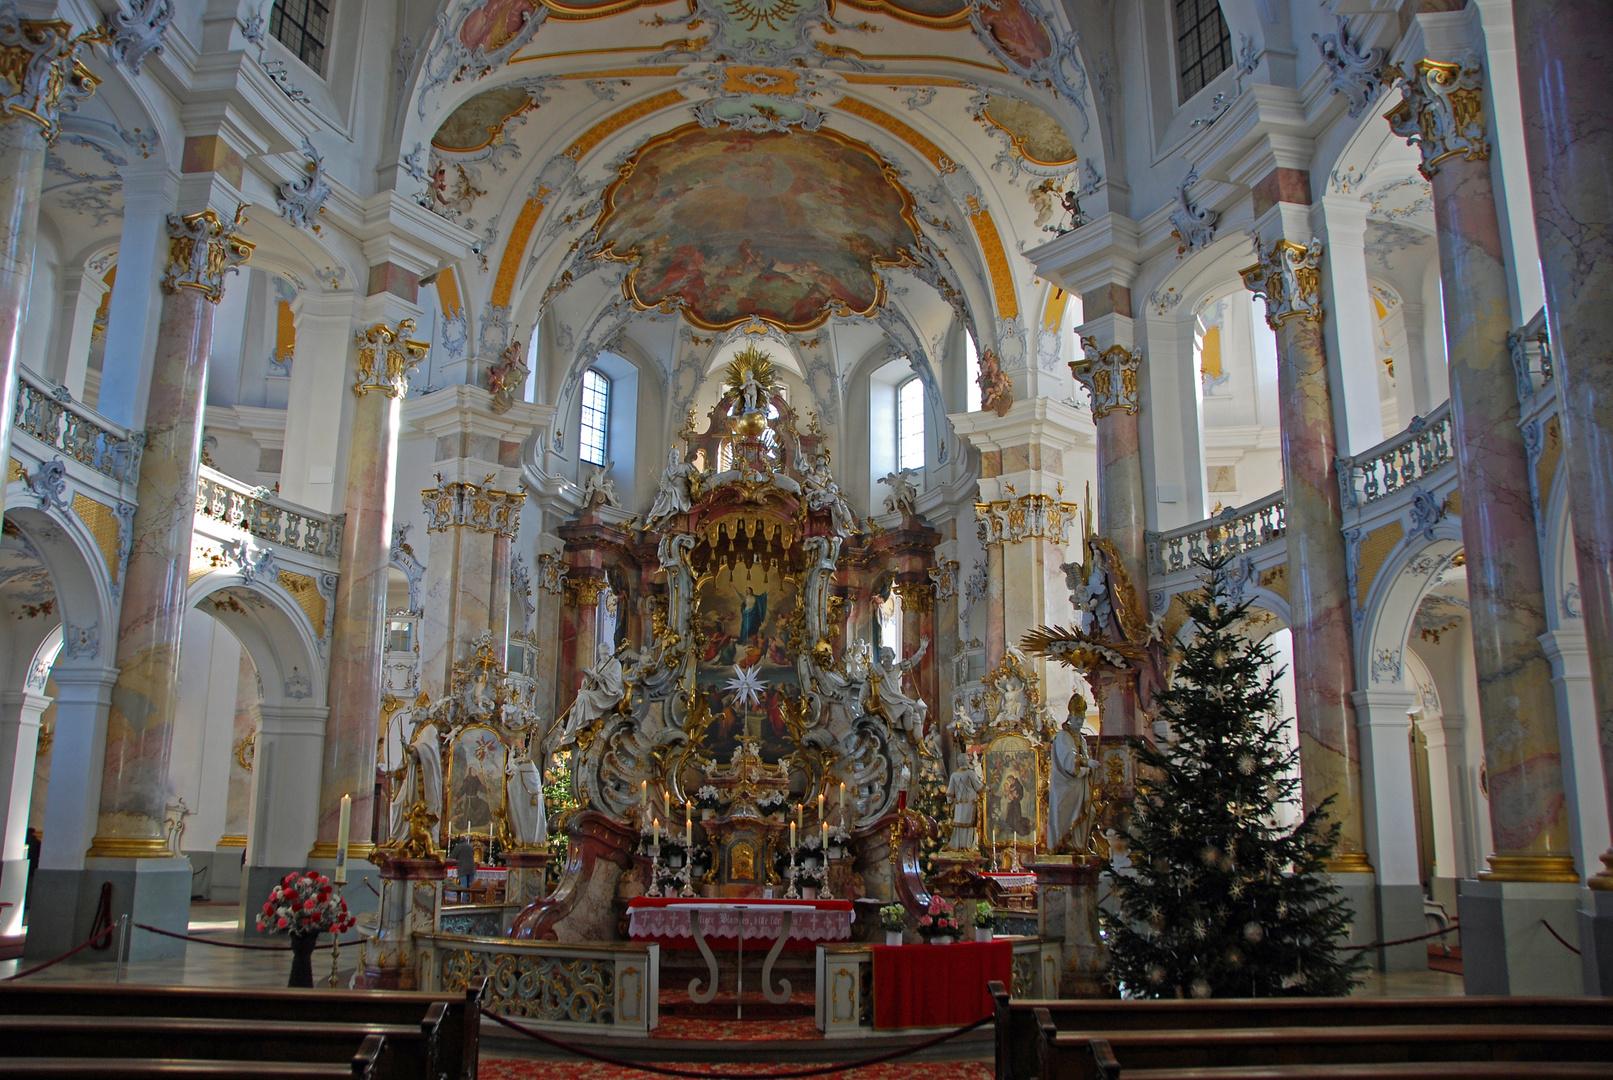 In meiner Lieblings - Basilika - Vierzehnheiligen